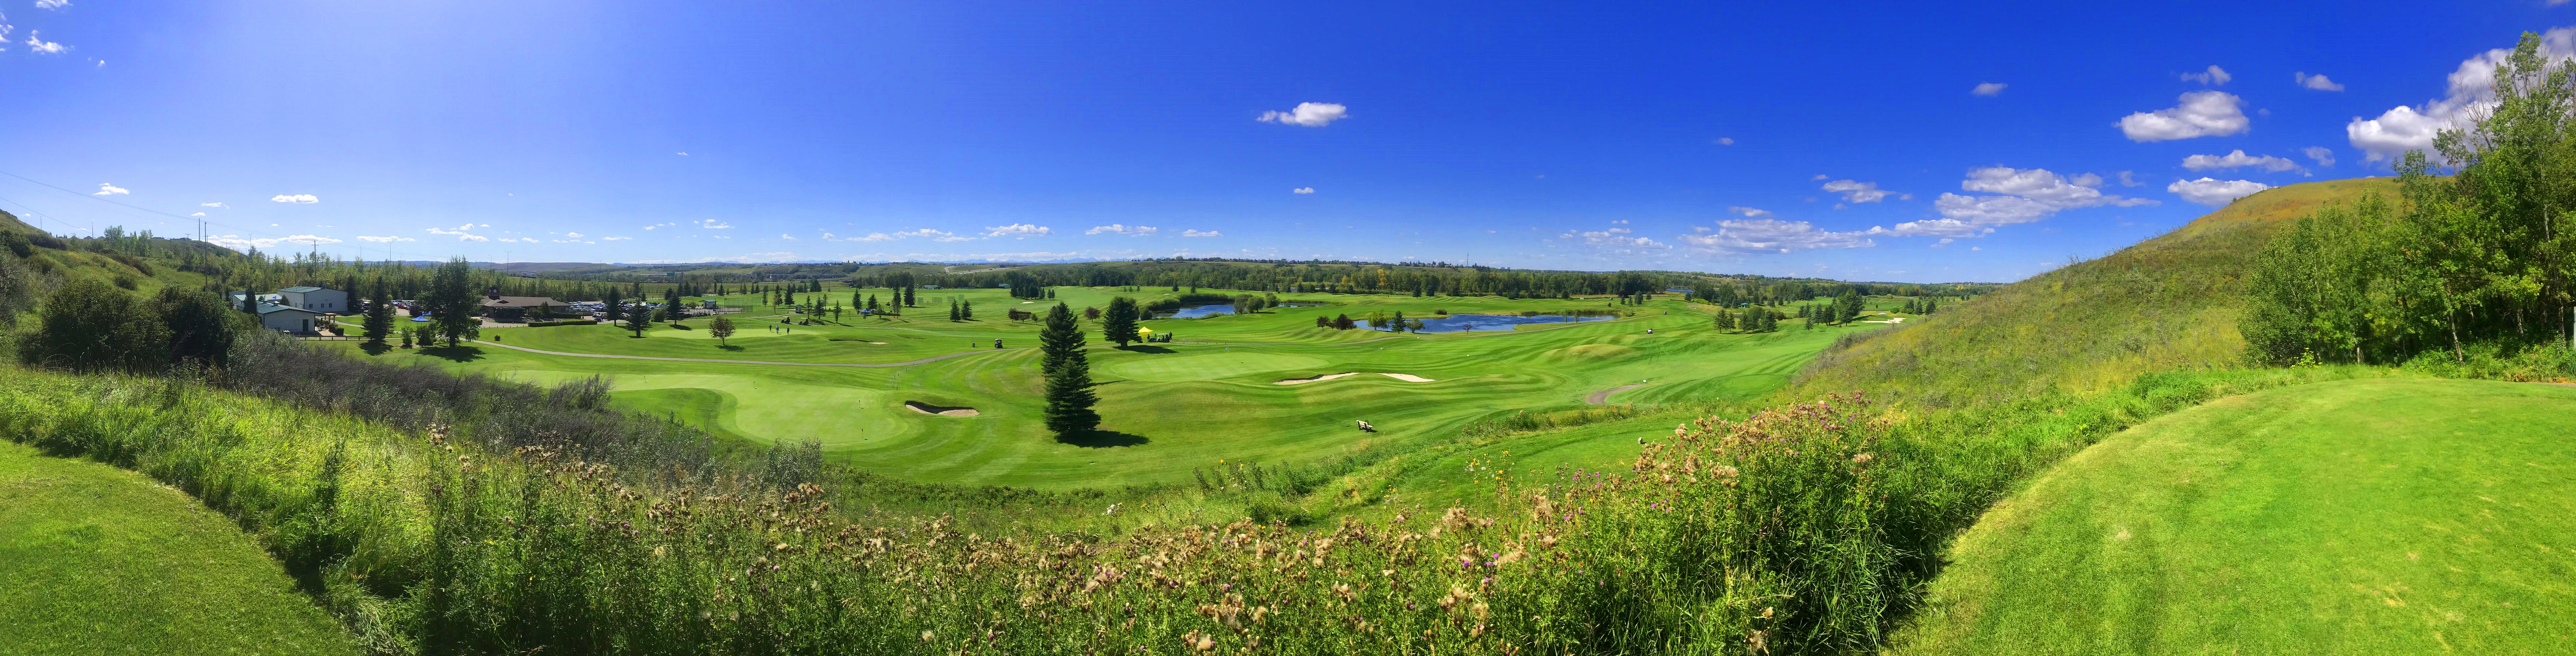 28th Annual Golf Extravaganza